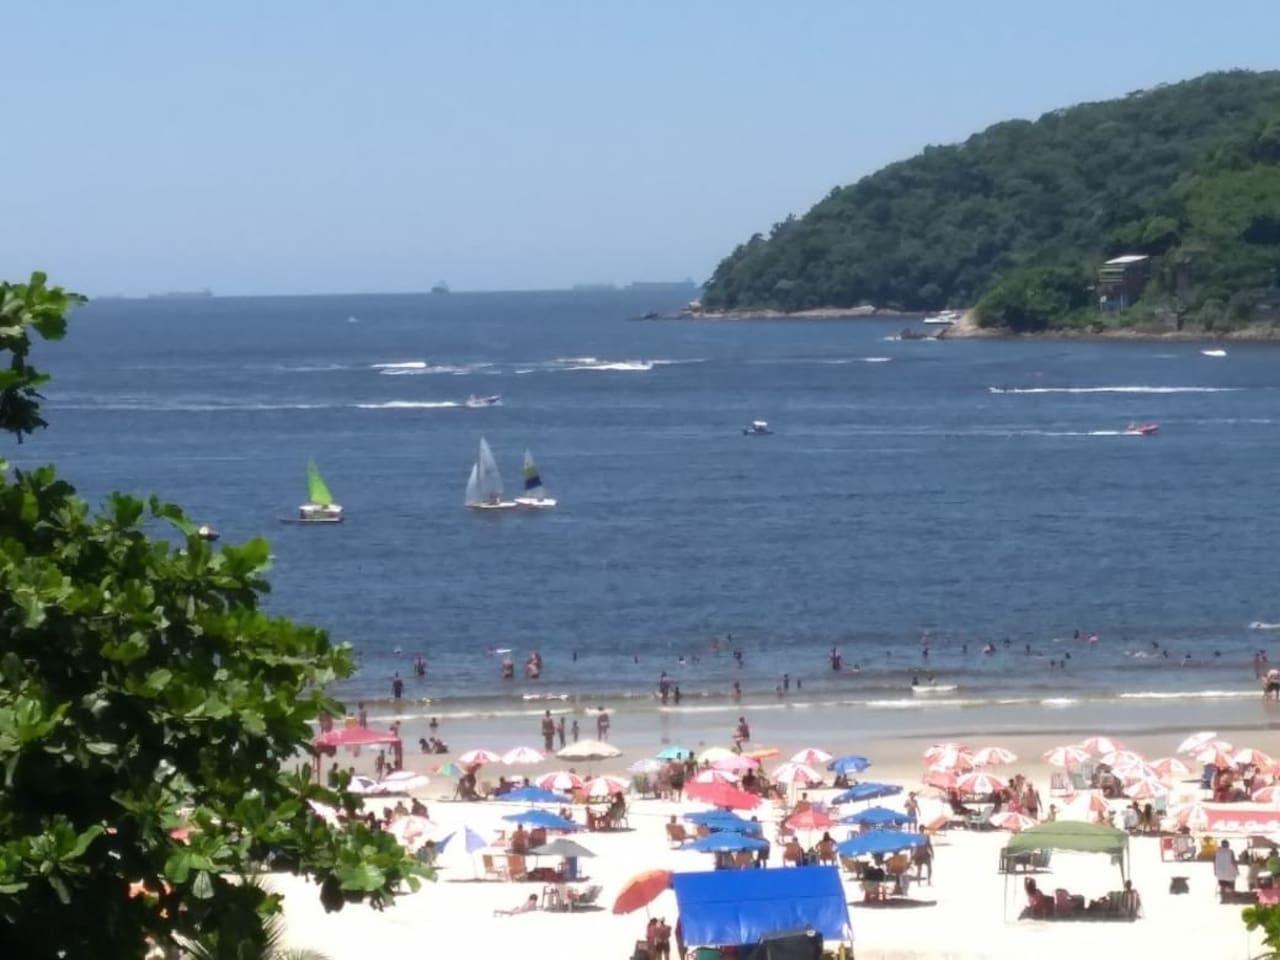 Vista da praia de Gonzaguinha